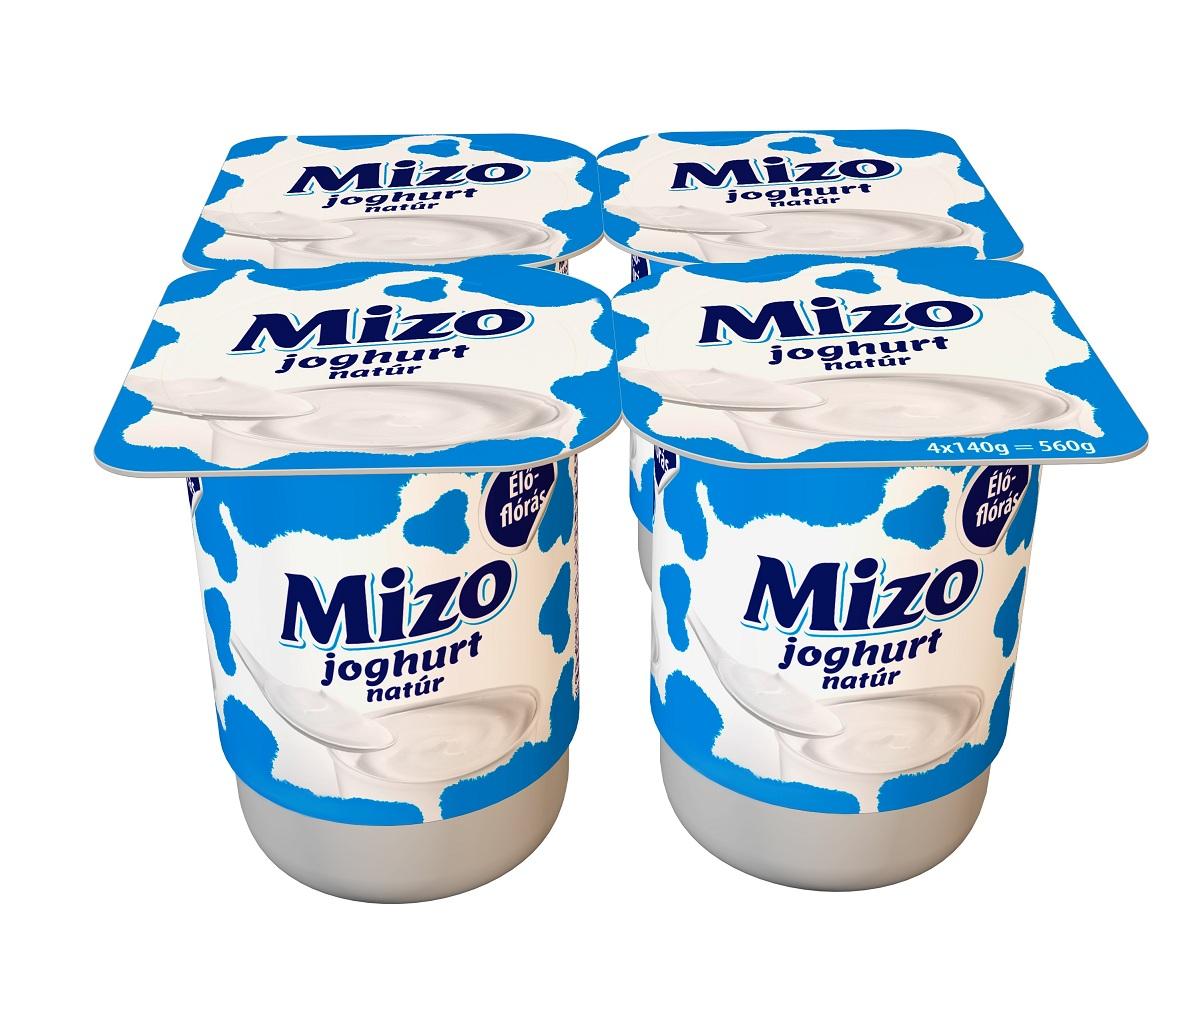 MIZO Joghurt natúr 4x140g